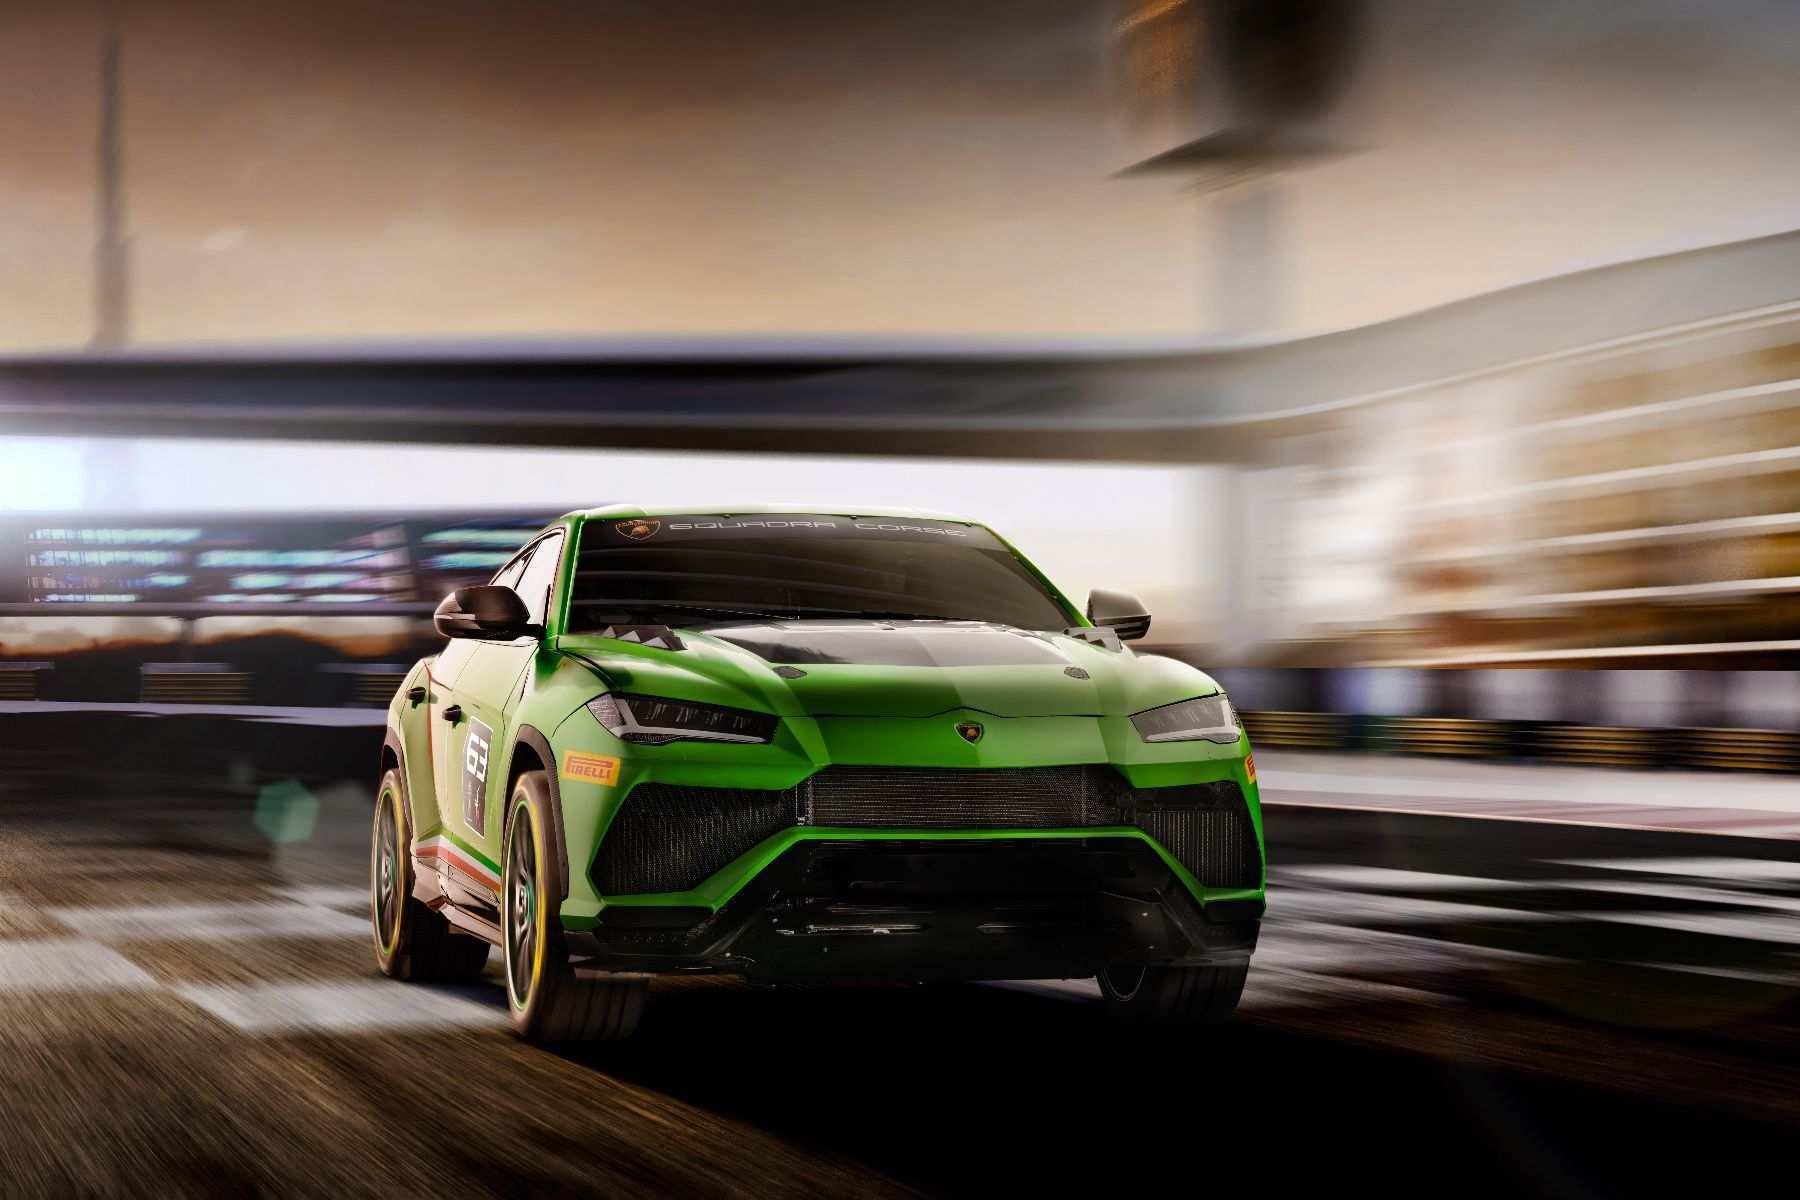 35 All New 2020 Lamborghini Urus Engine by 2020 Lamborghini Urus